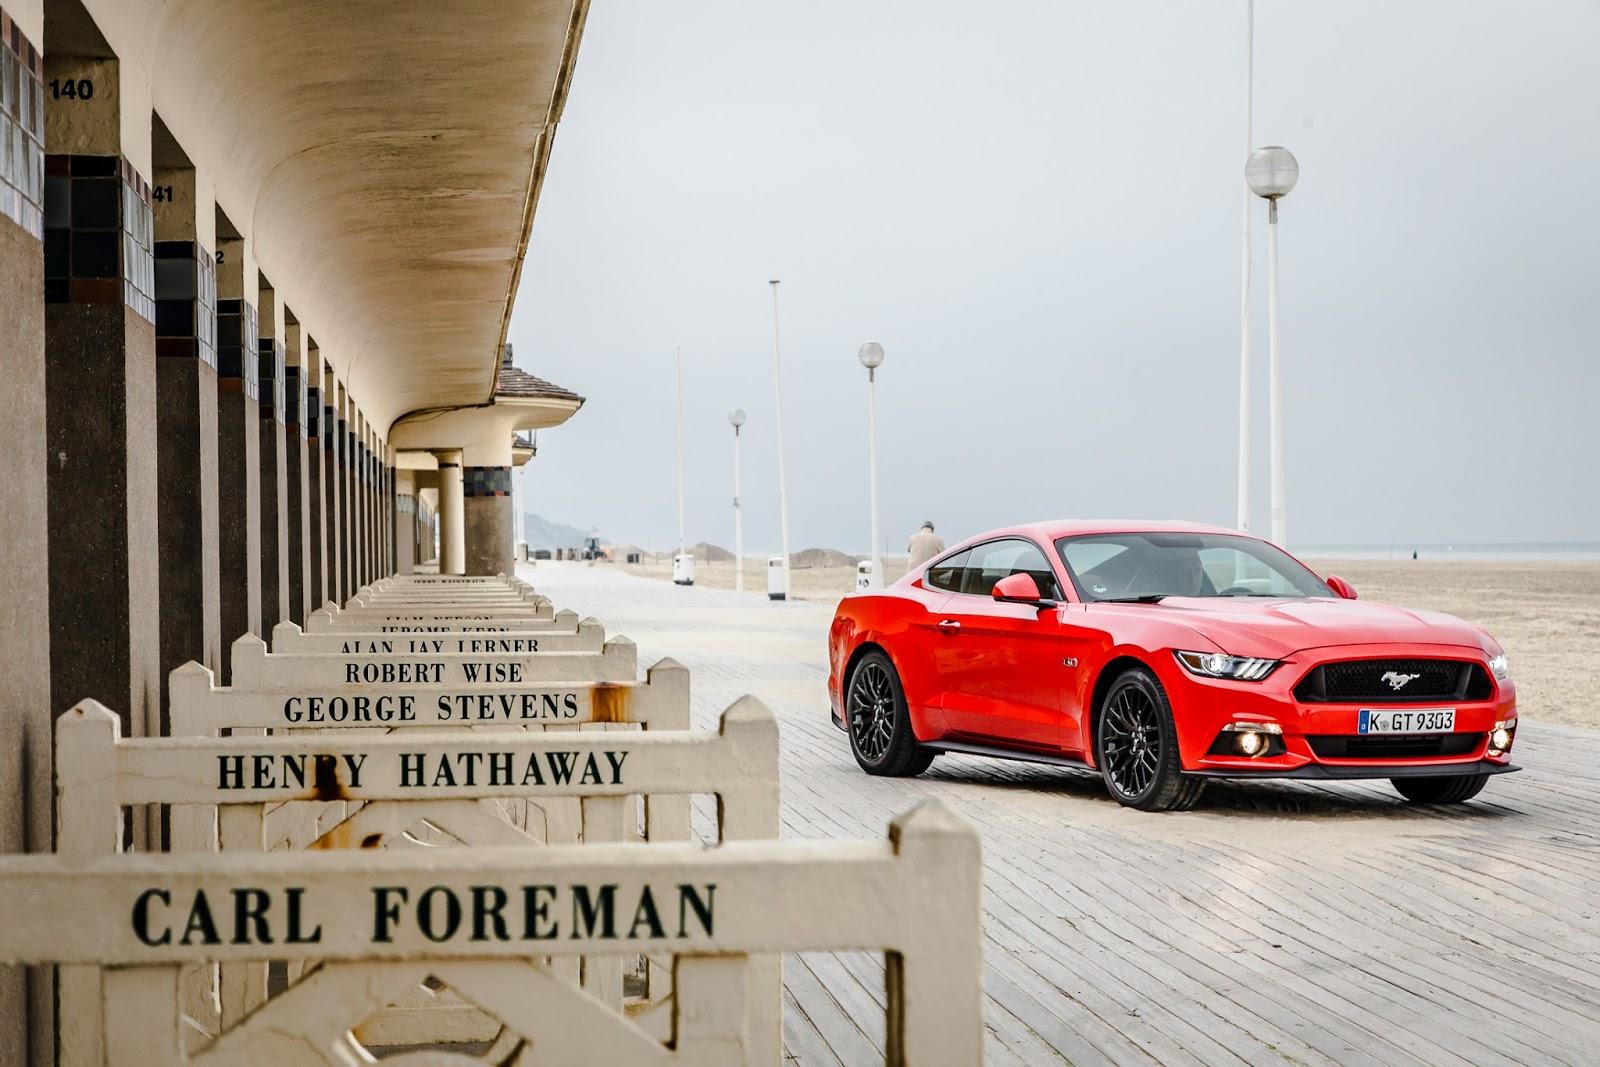 MustangDriveDeauville2015 03 Άνοδος Ευρωπαϊκών πωλήσεων για την Ford Ford, Sales, πωλήσεις, πωλήσεις αυτοκινήτων